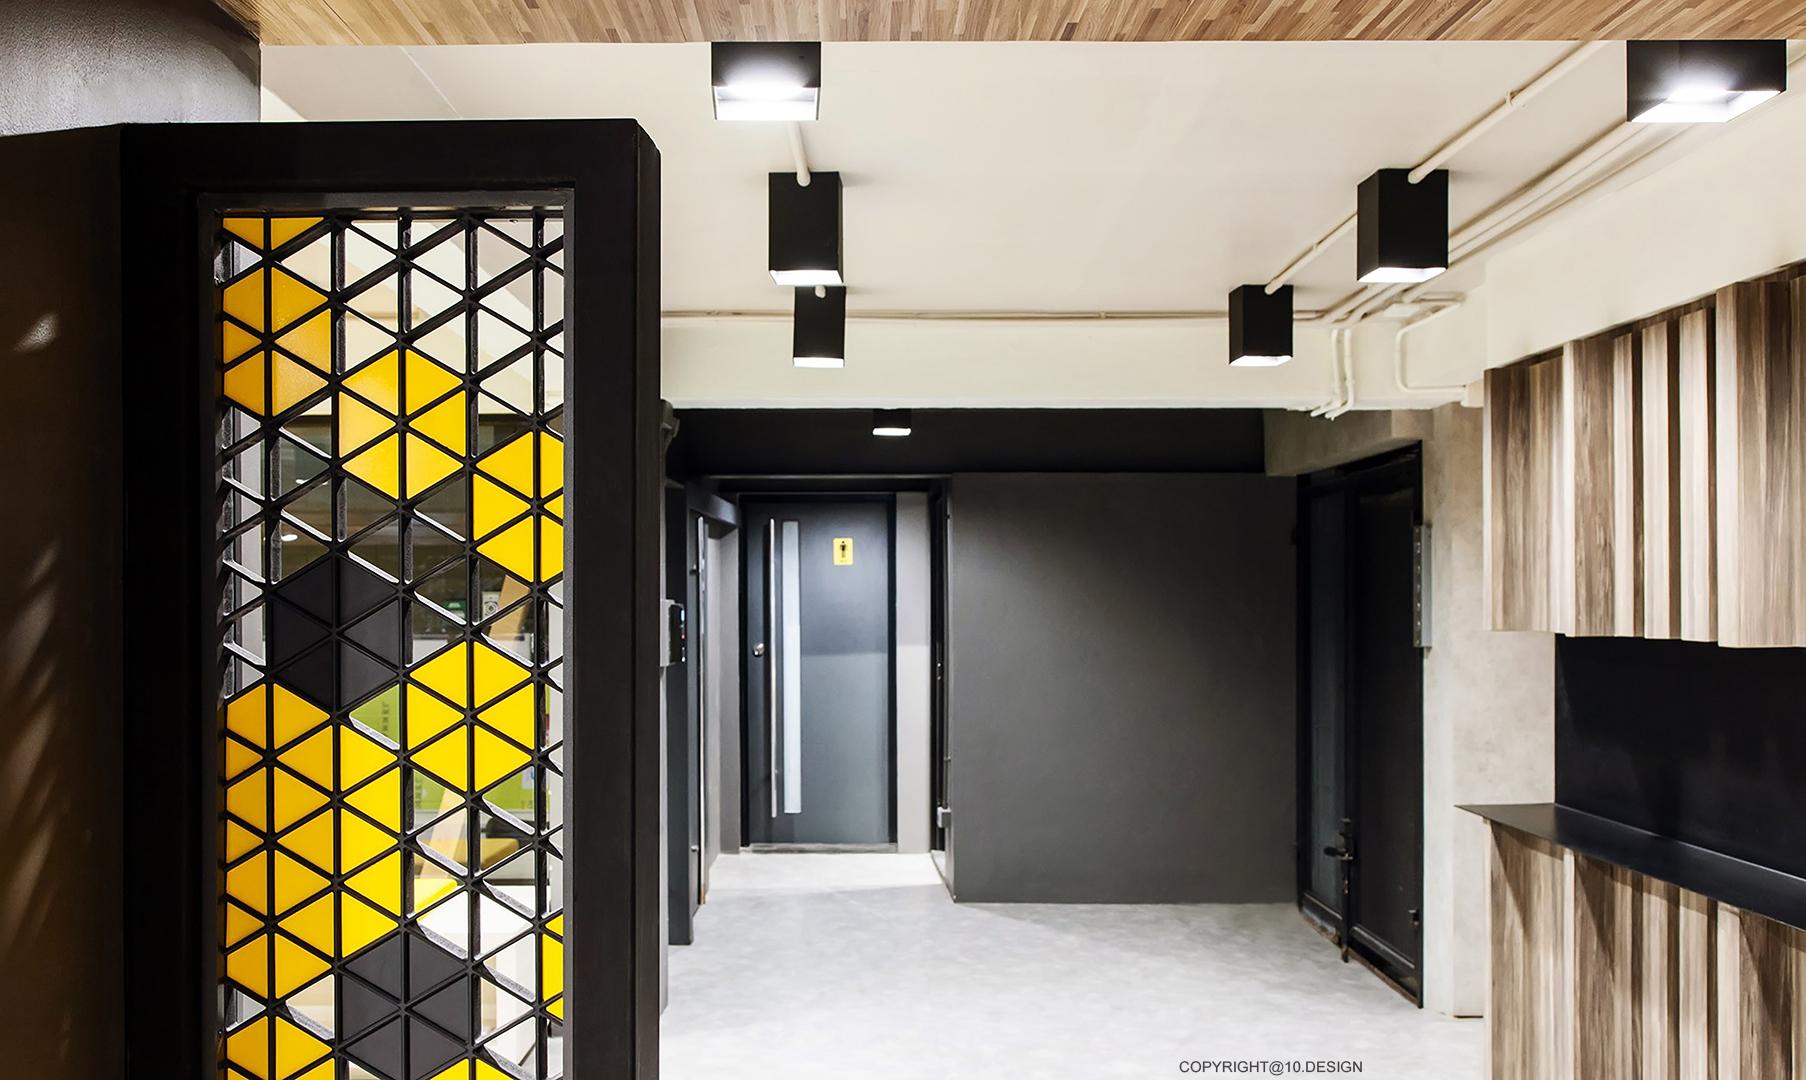 10DESIGN ookbee head office interior design start up 06